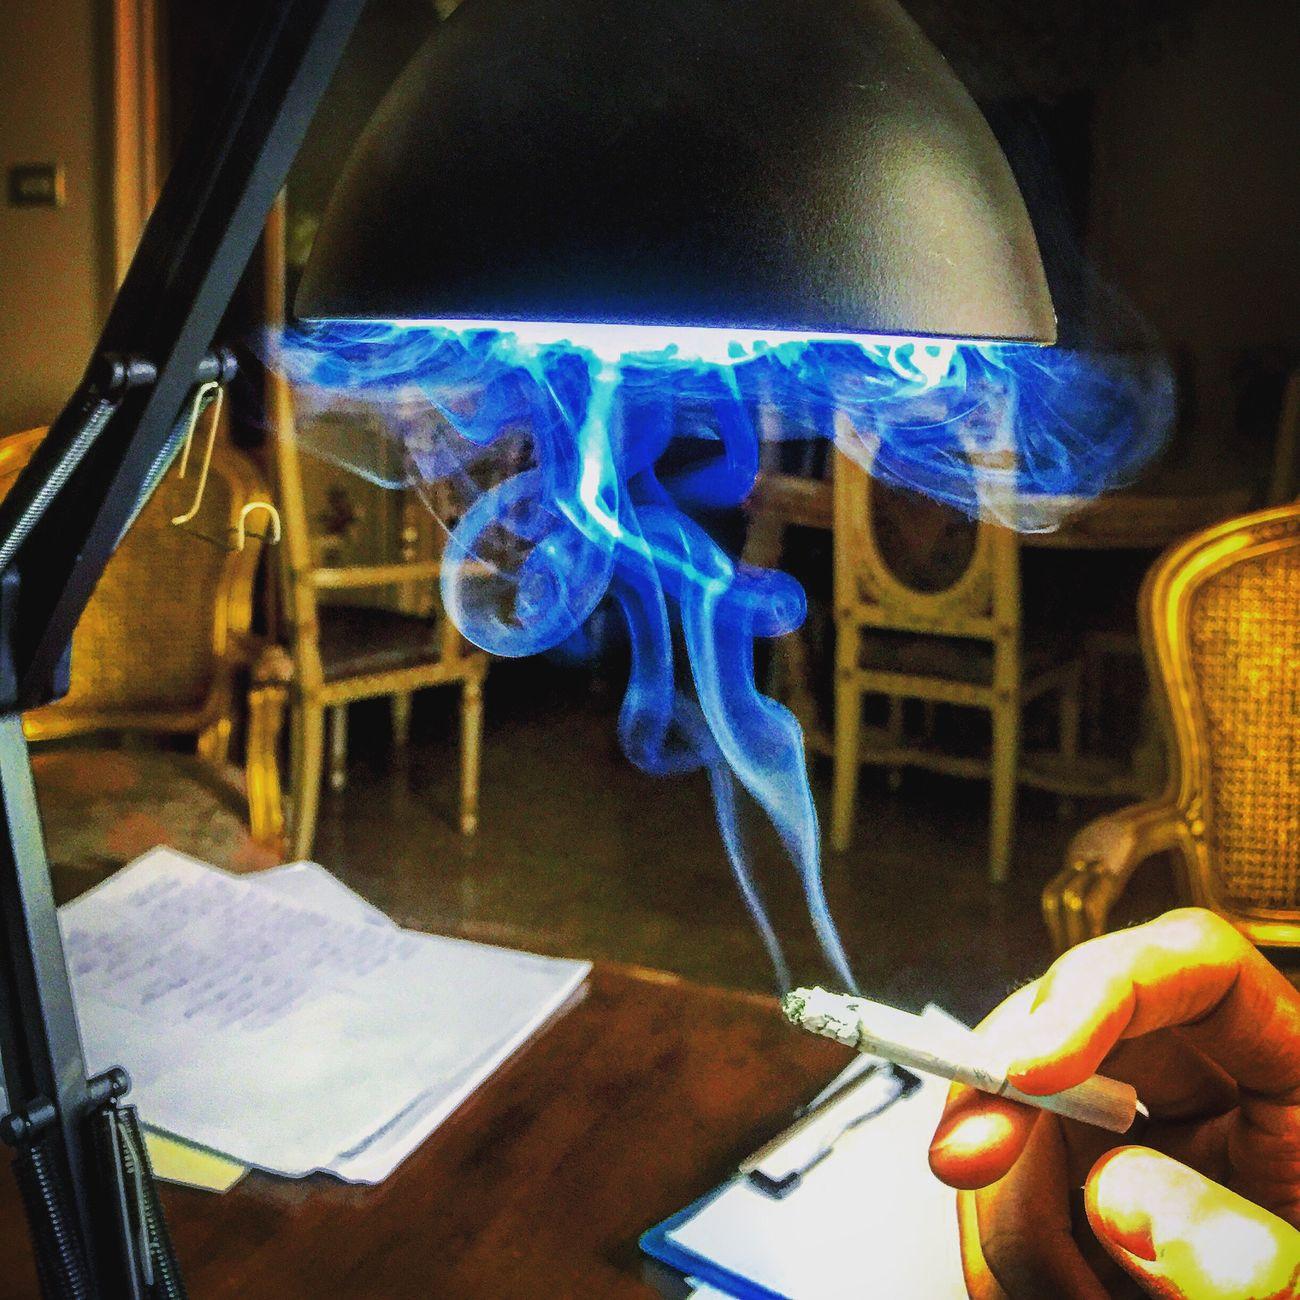 Winestone Sigara Studying Tb :) Indoors  Burning Close-up Real People Illuminated One Person Human Hand